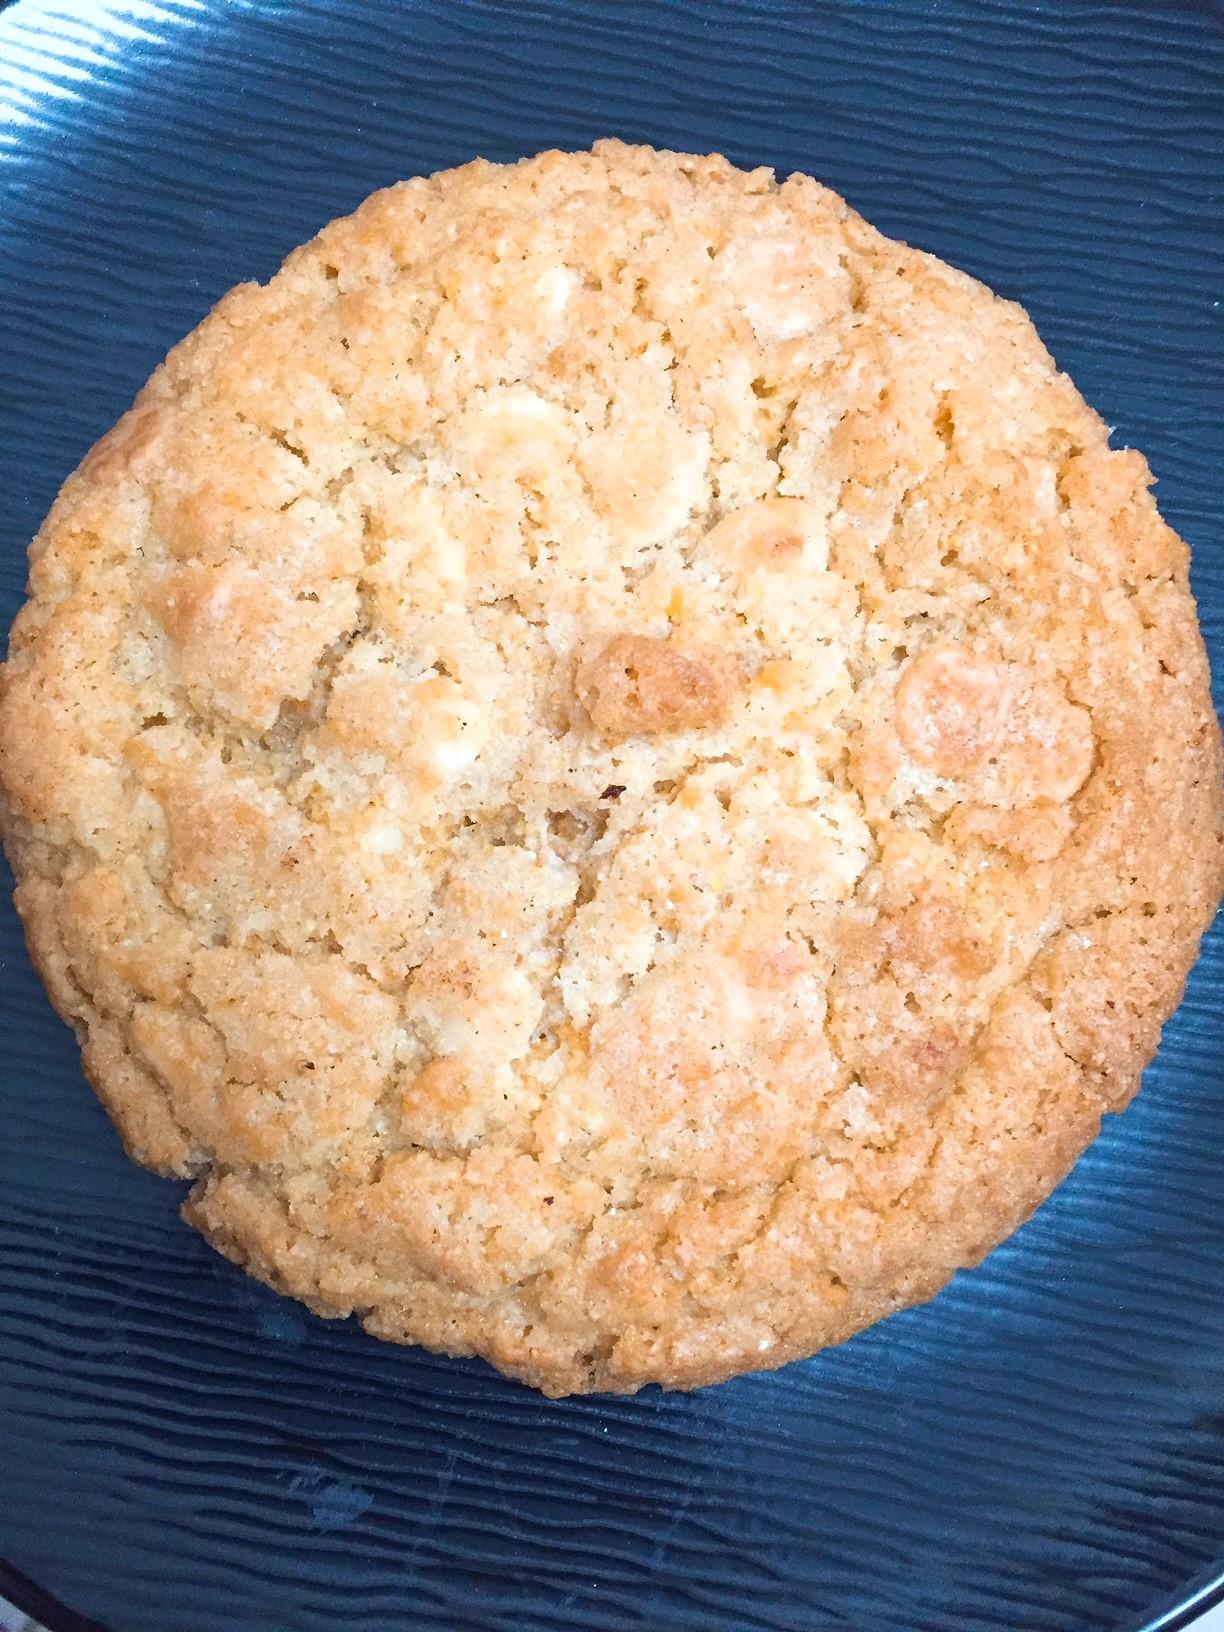 Cindy Lou's Cookies Miami capt crunch cookie.jpg